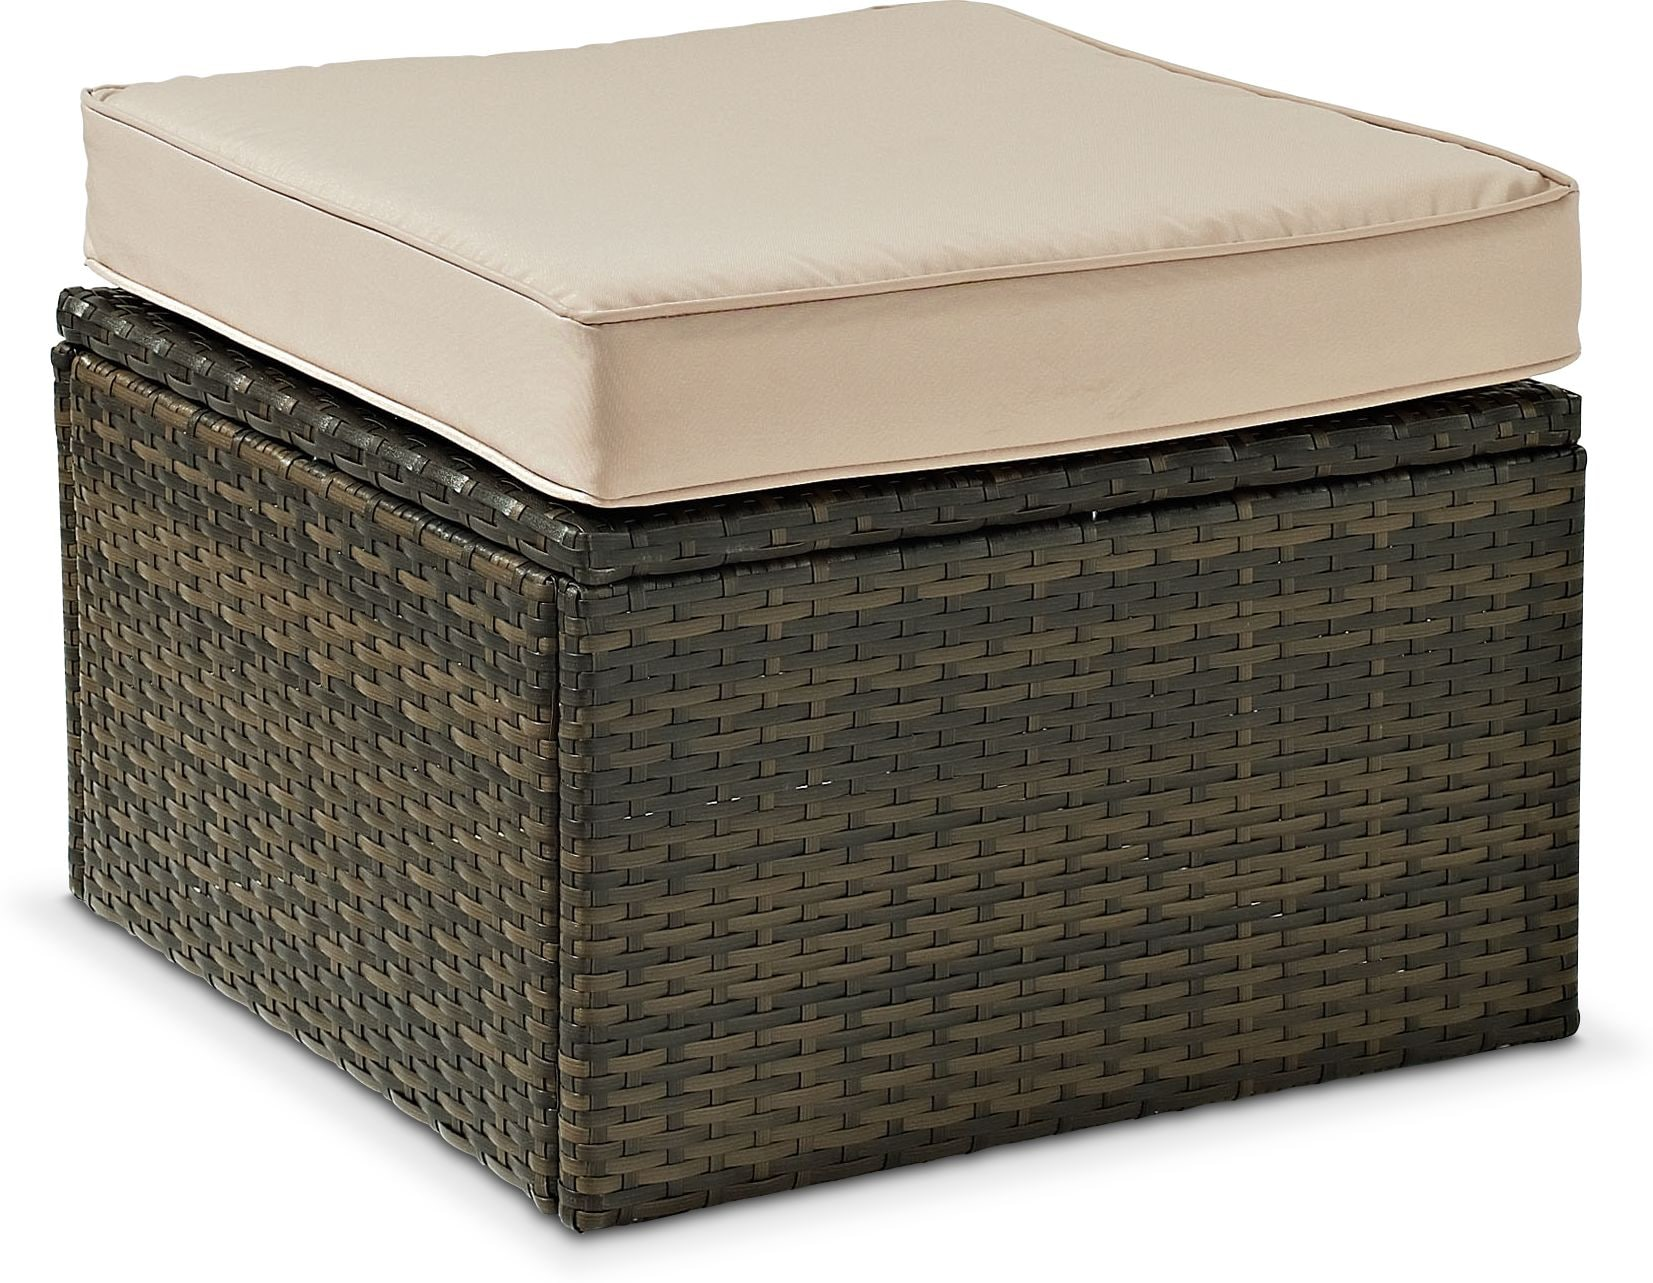 Outdoor Furniture - Aldo Outdoor Ottoman